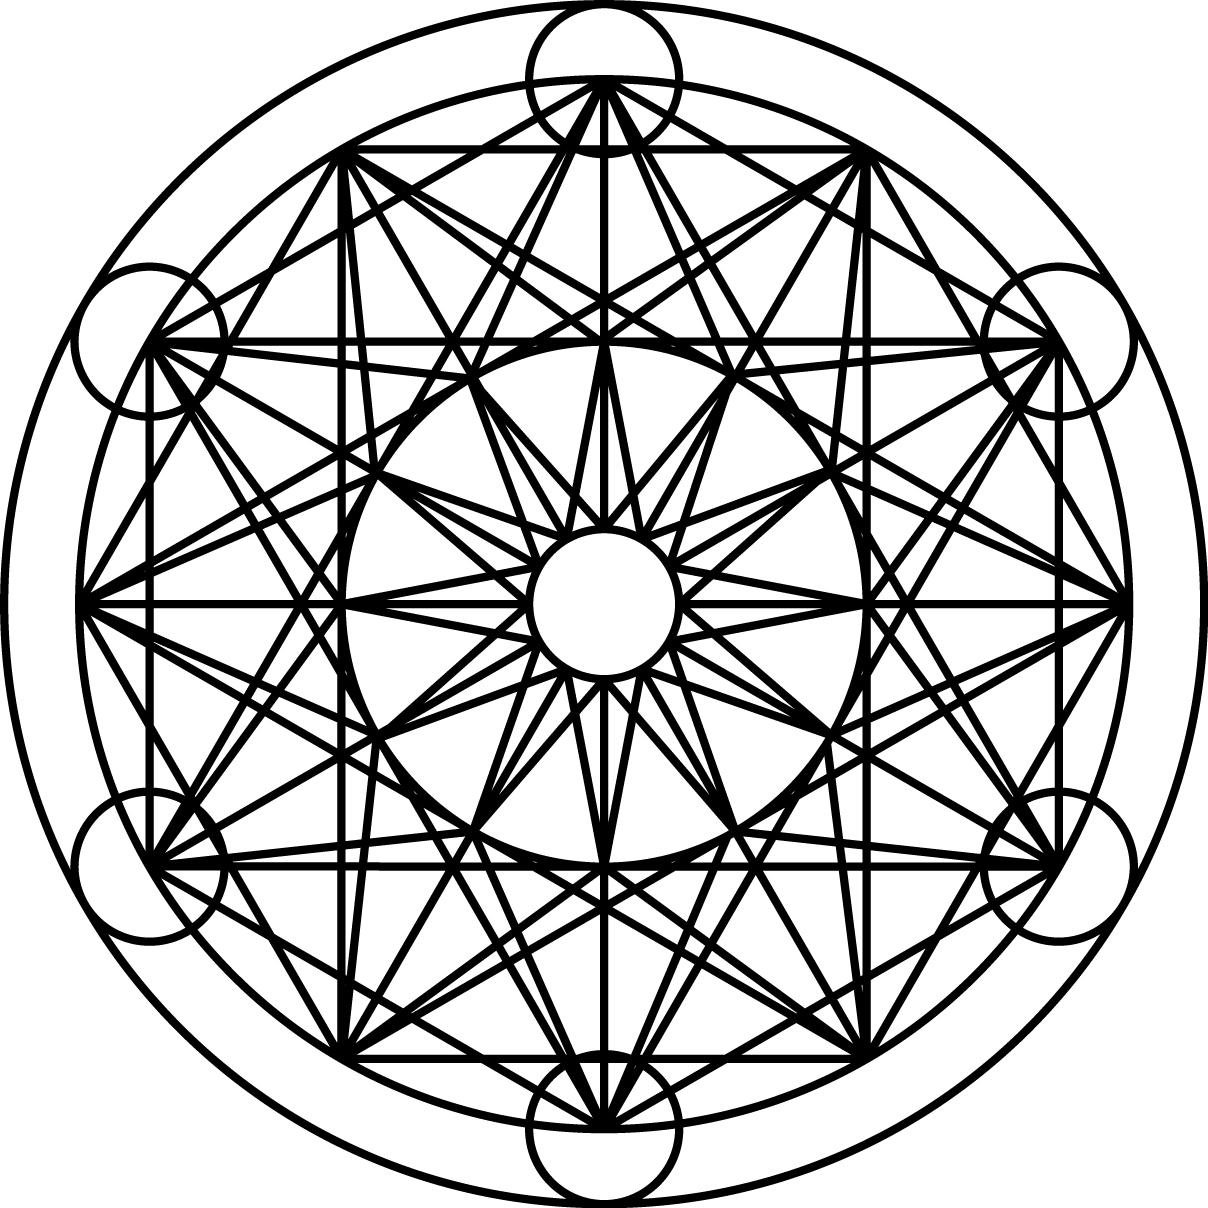 Magic Circles And Orgone The Digital Ambler